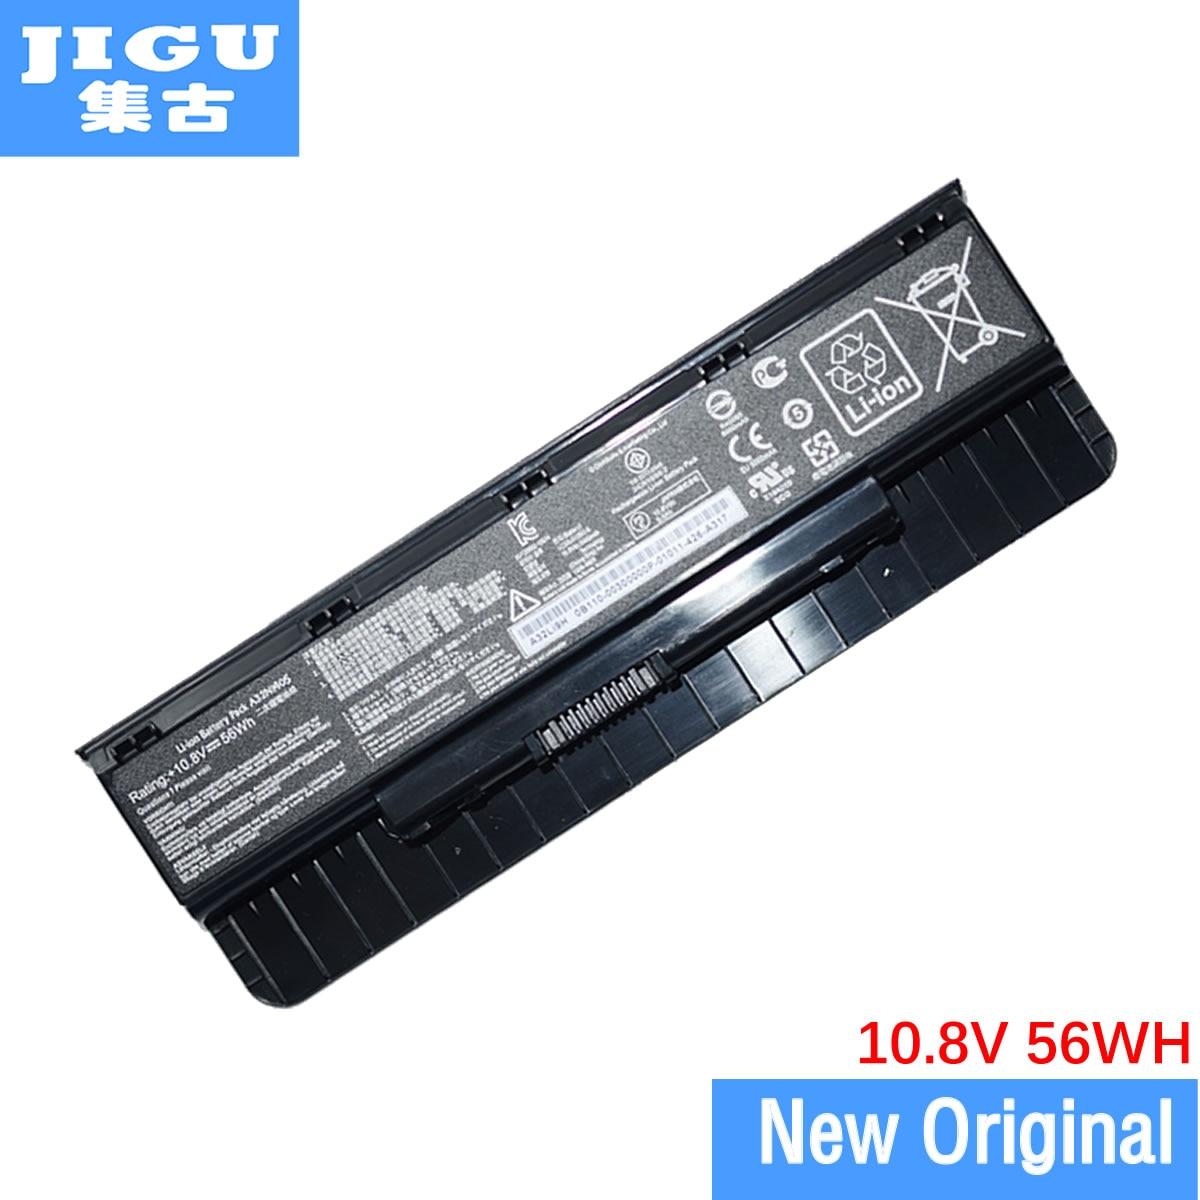 JIGU A32LI9H A32N1405 Original Laptop Battery For Asus G551 G551J G58 G771 GL551 GL771 N551 N751 10.8V 56WH